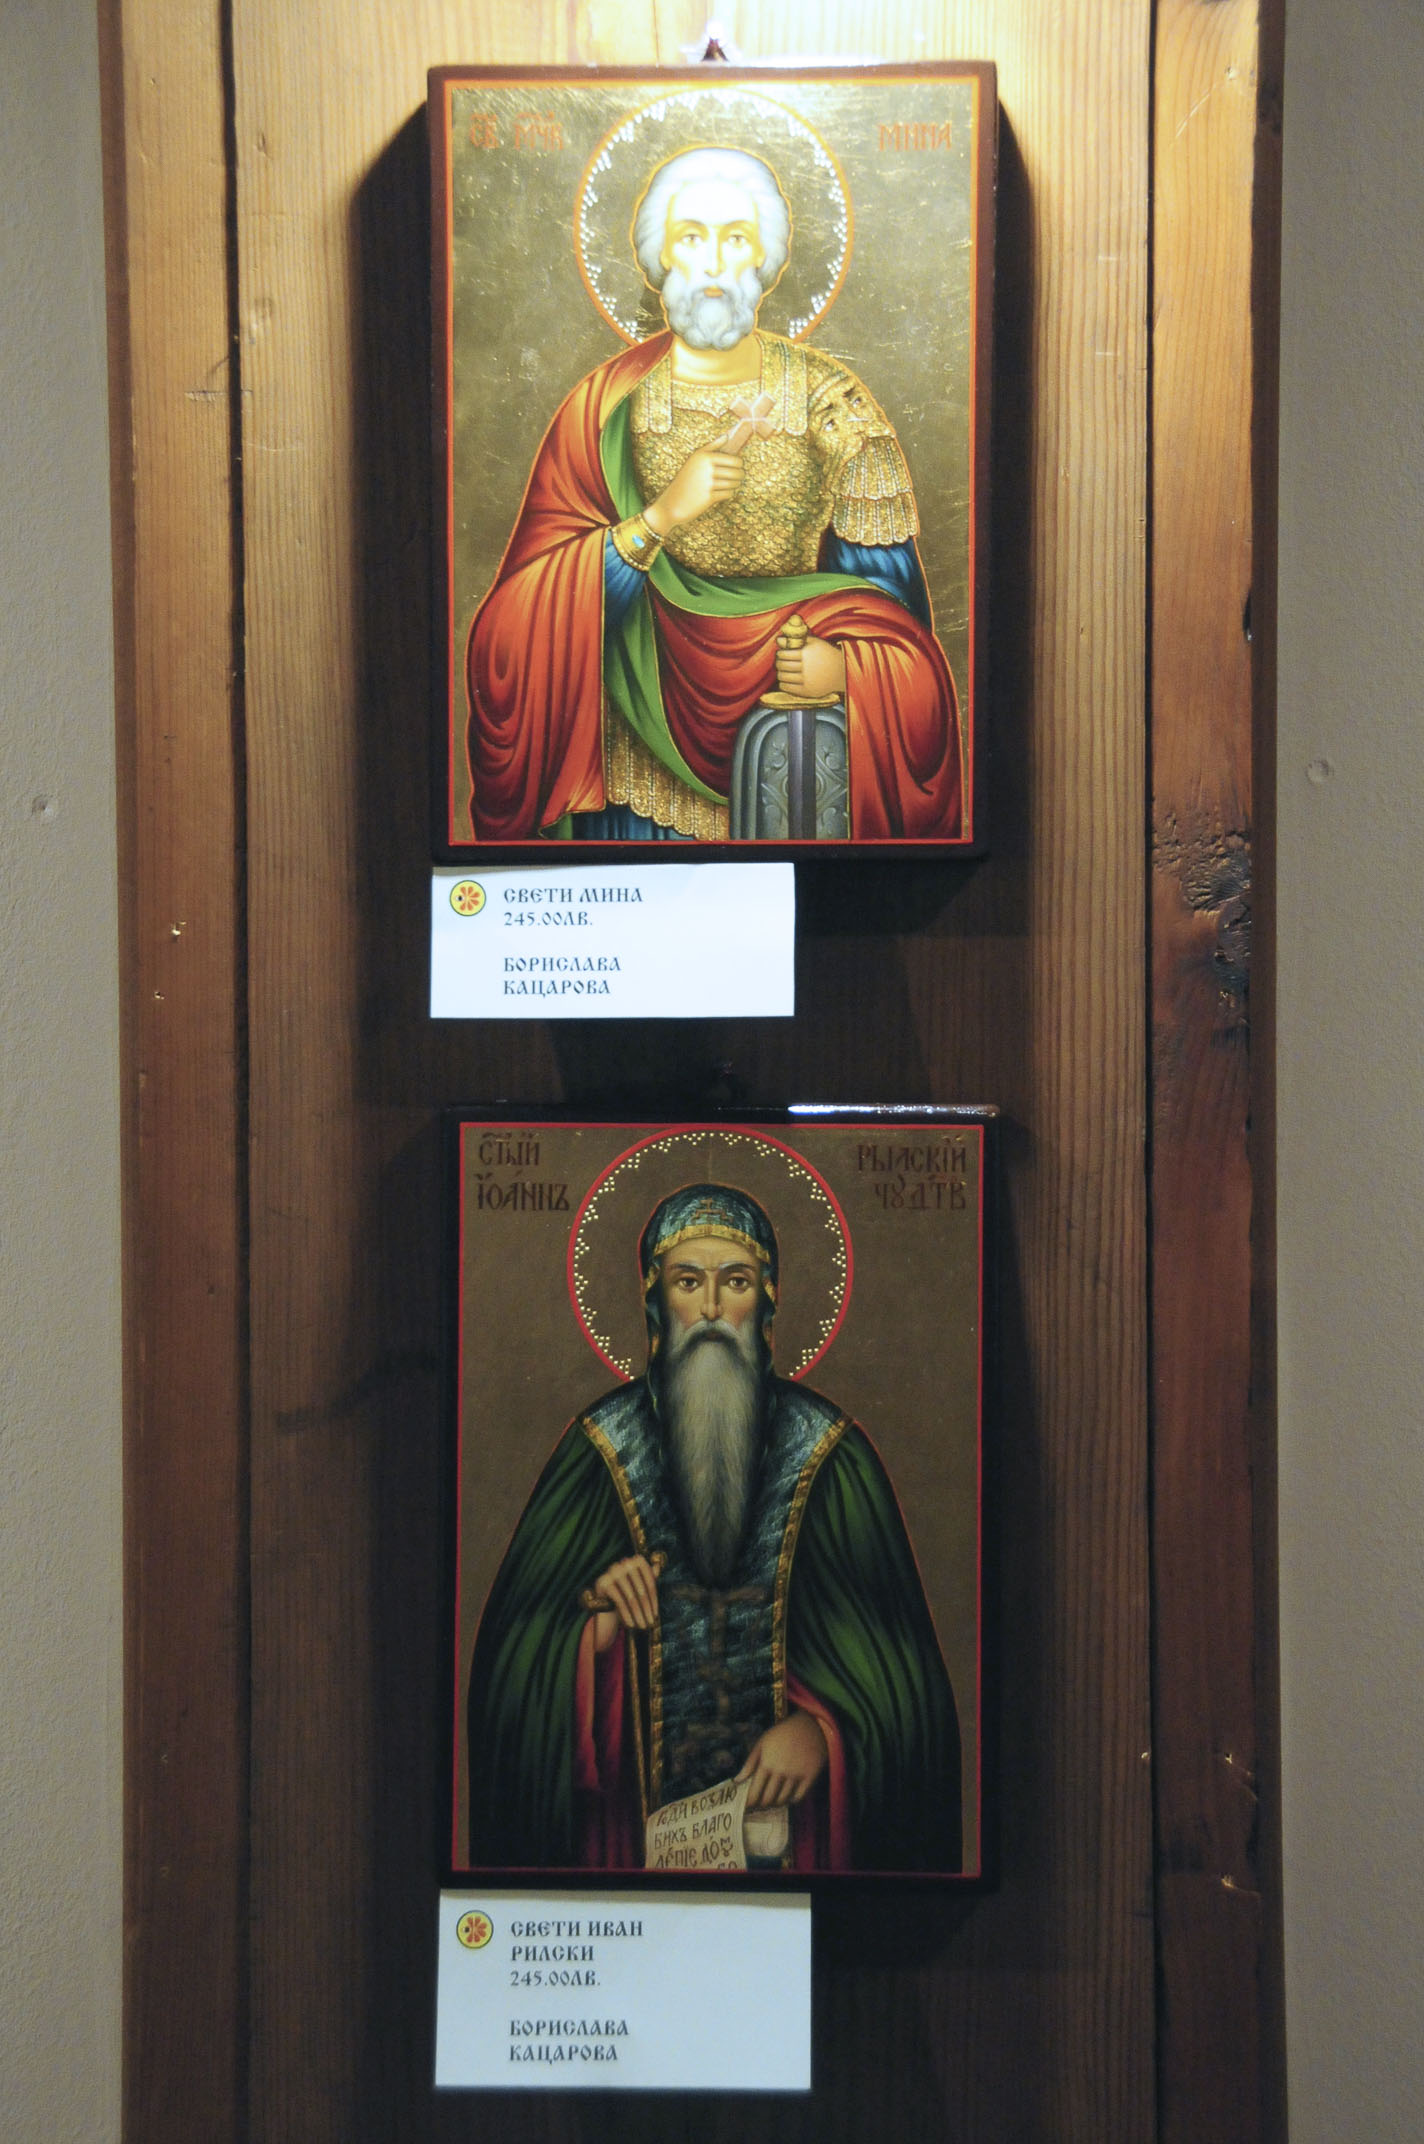 troyan-museum-sveti-spiridon-10